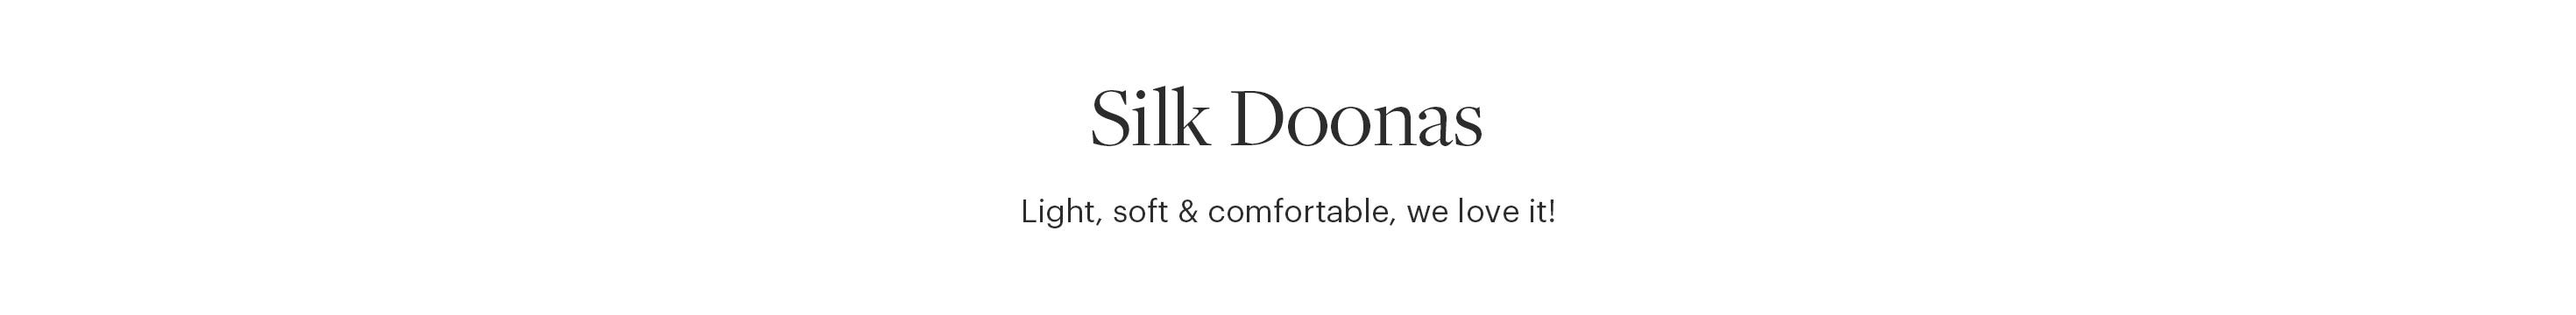 Silk Doonas